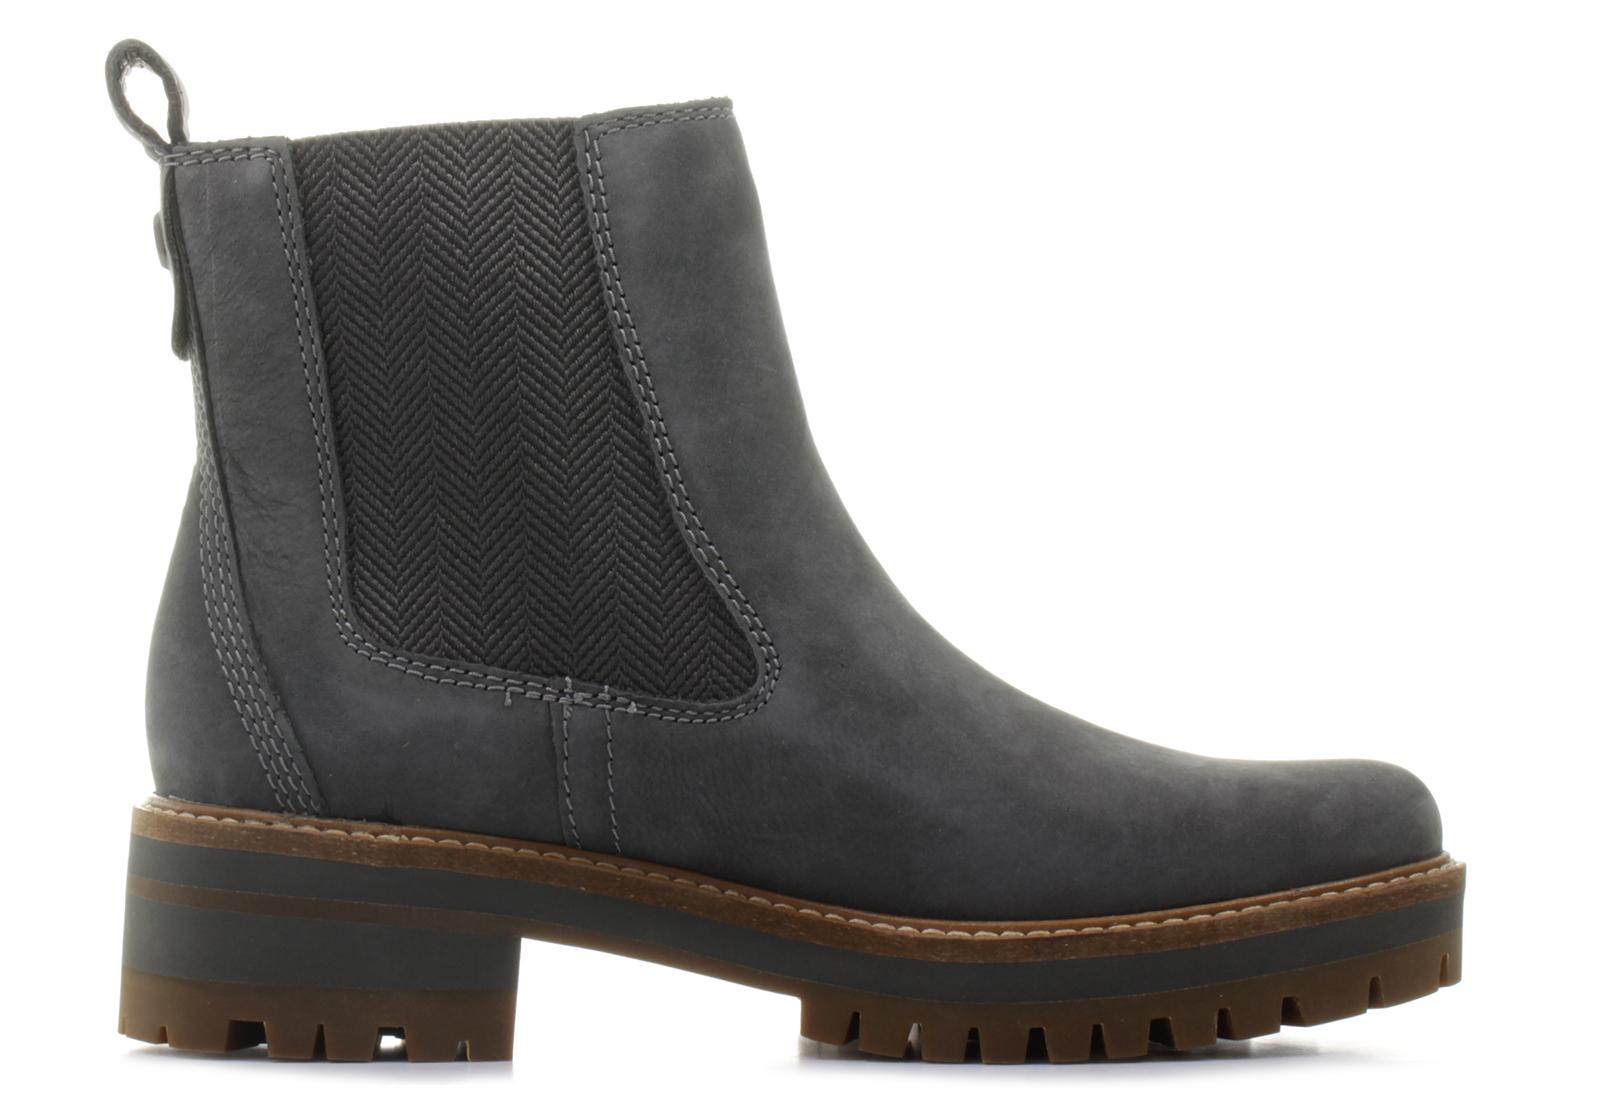 Timberland Boots Courmayeur Valley A1j58 Gry Online